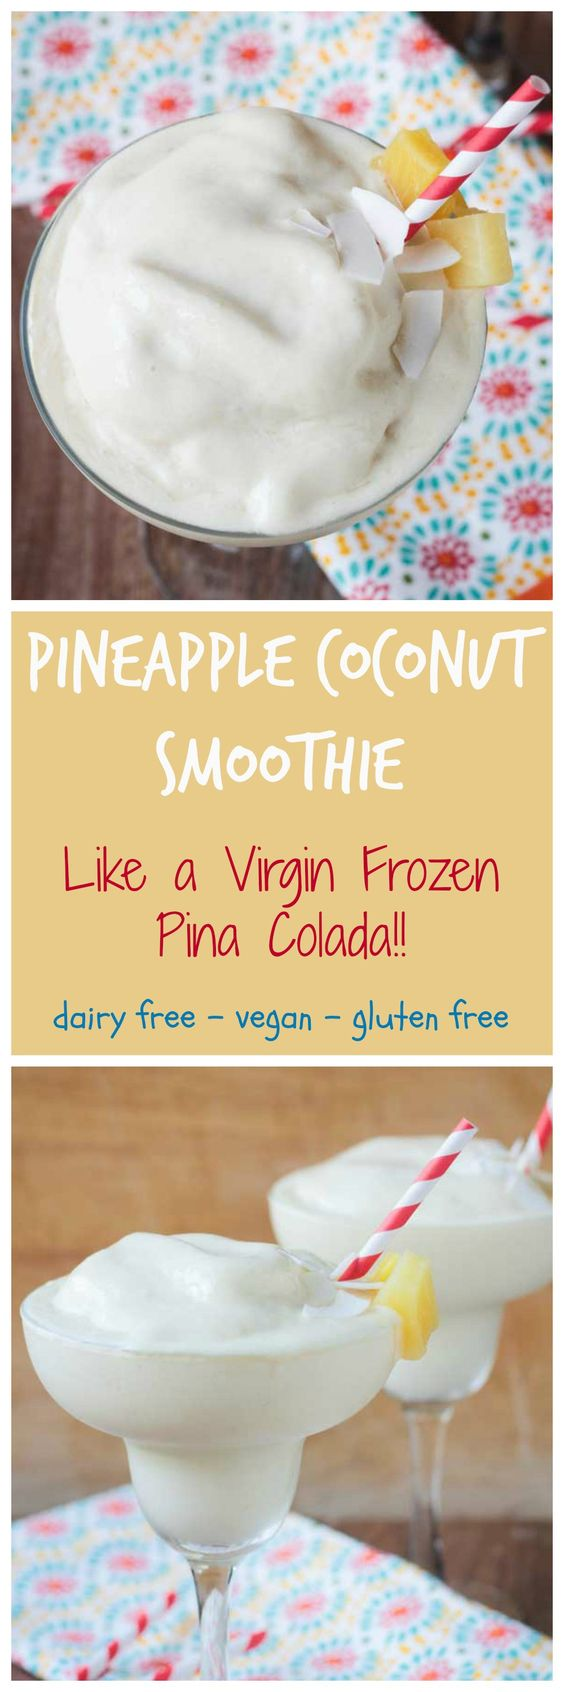 how to make coconut yogurt with tapioca